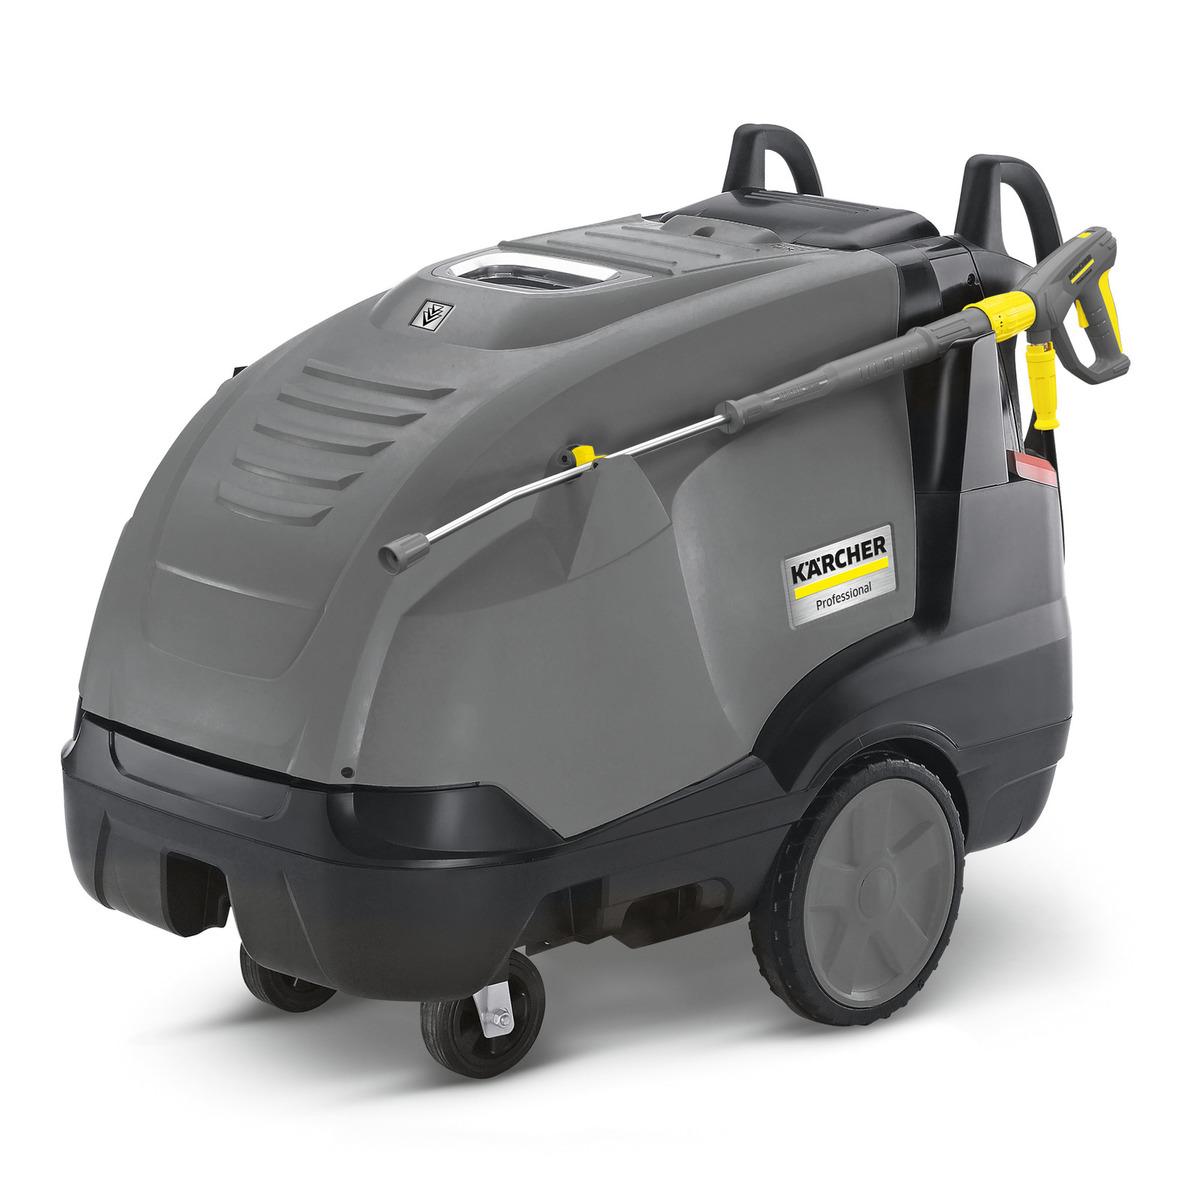 HDS 12/18-4 S热水高压清洗机